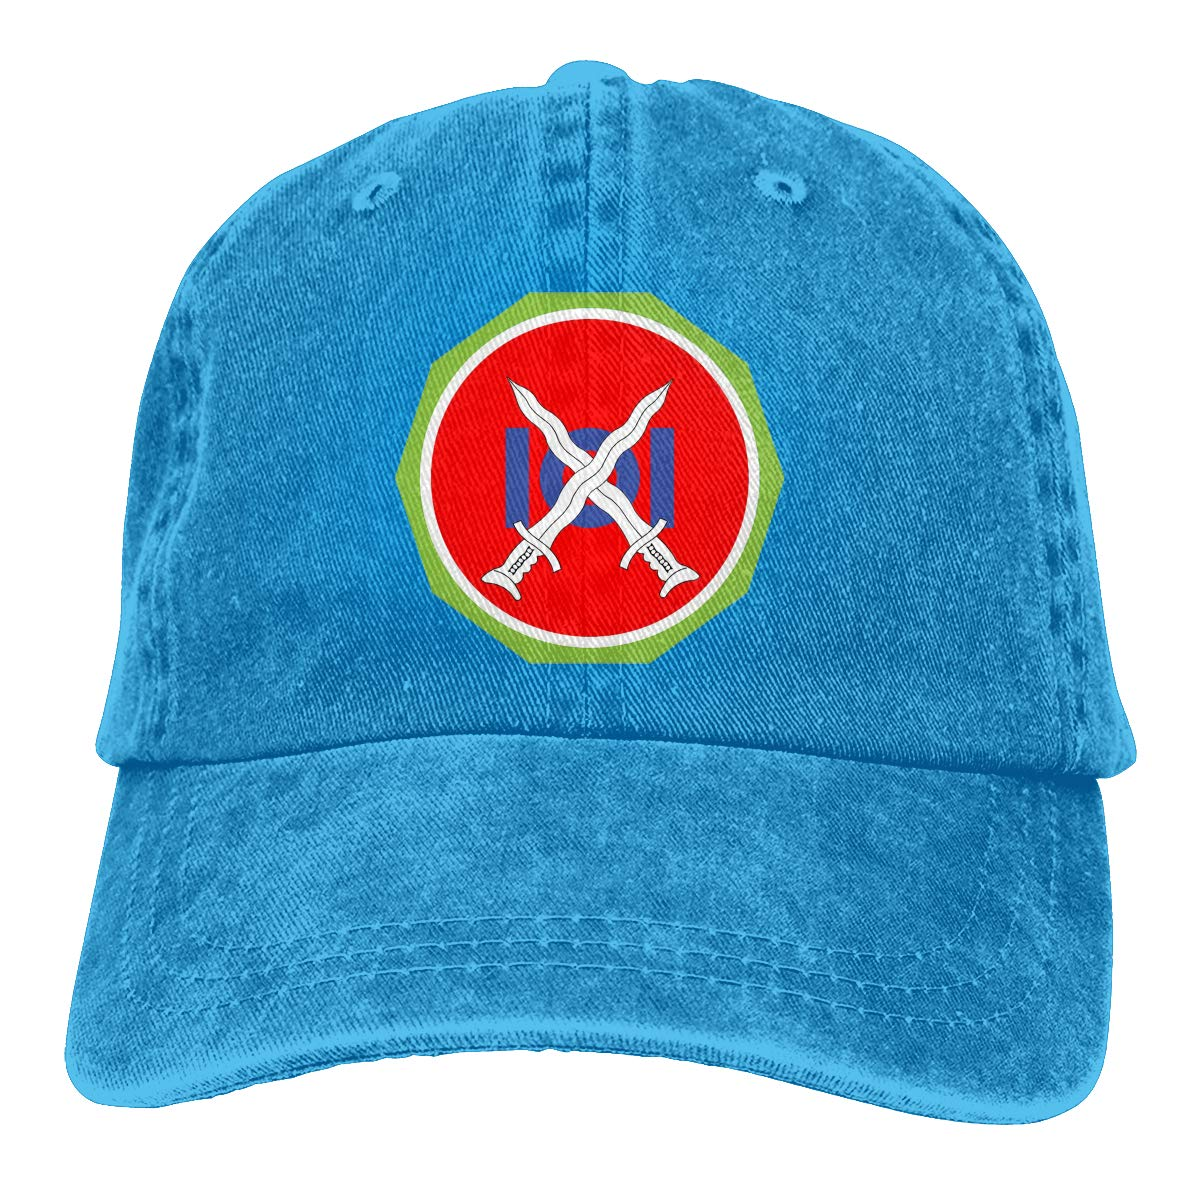 Sajfirlug 101st Philippine Division Fashion Adjustable Cowboy Cap Denim Hat for Women and Men